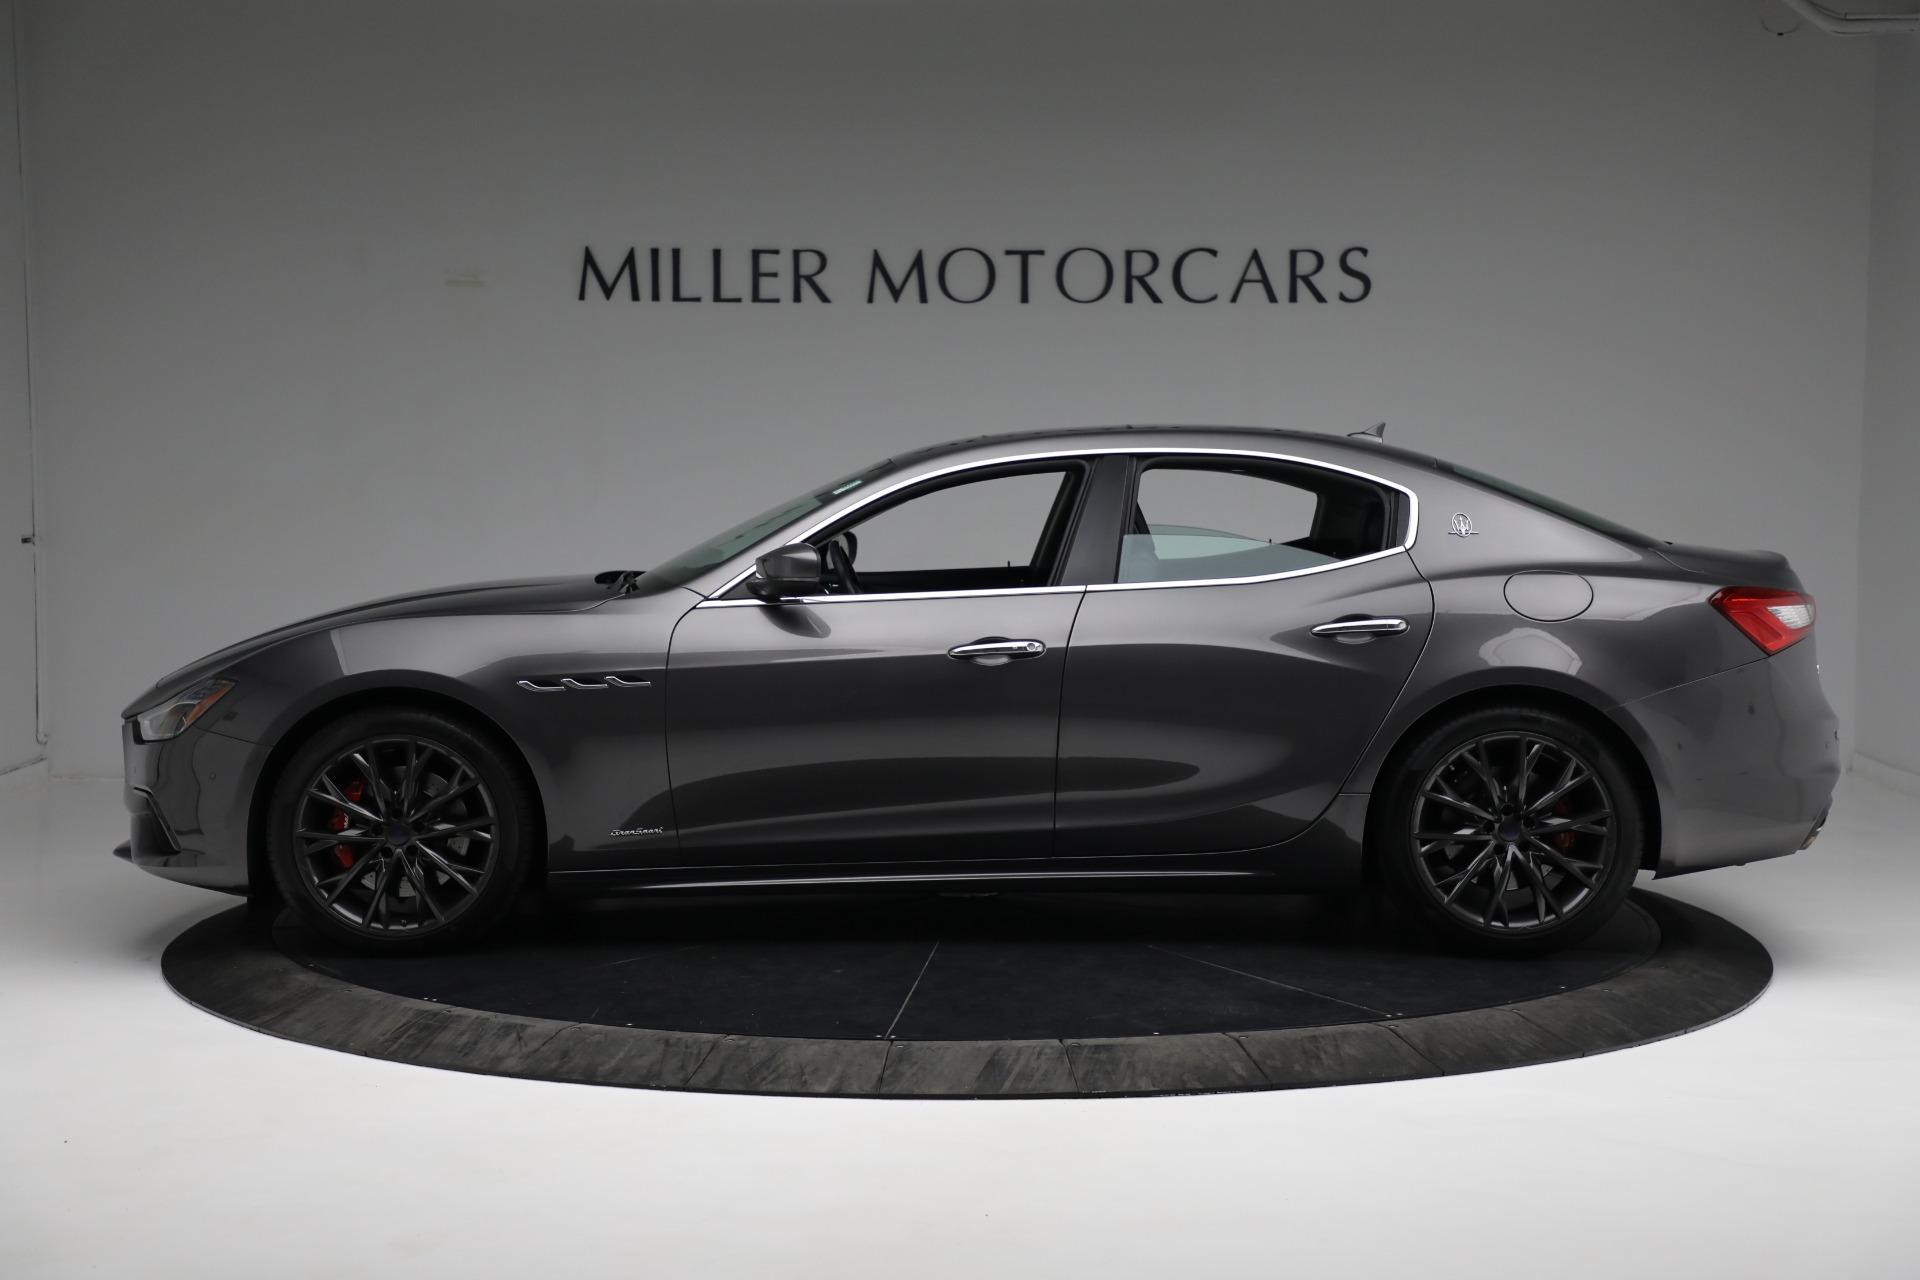 New 2019 Maserati Ghibli S Q4 GranSport For Sale In Greenwich, CT 3493_p3